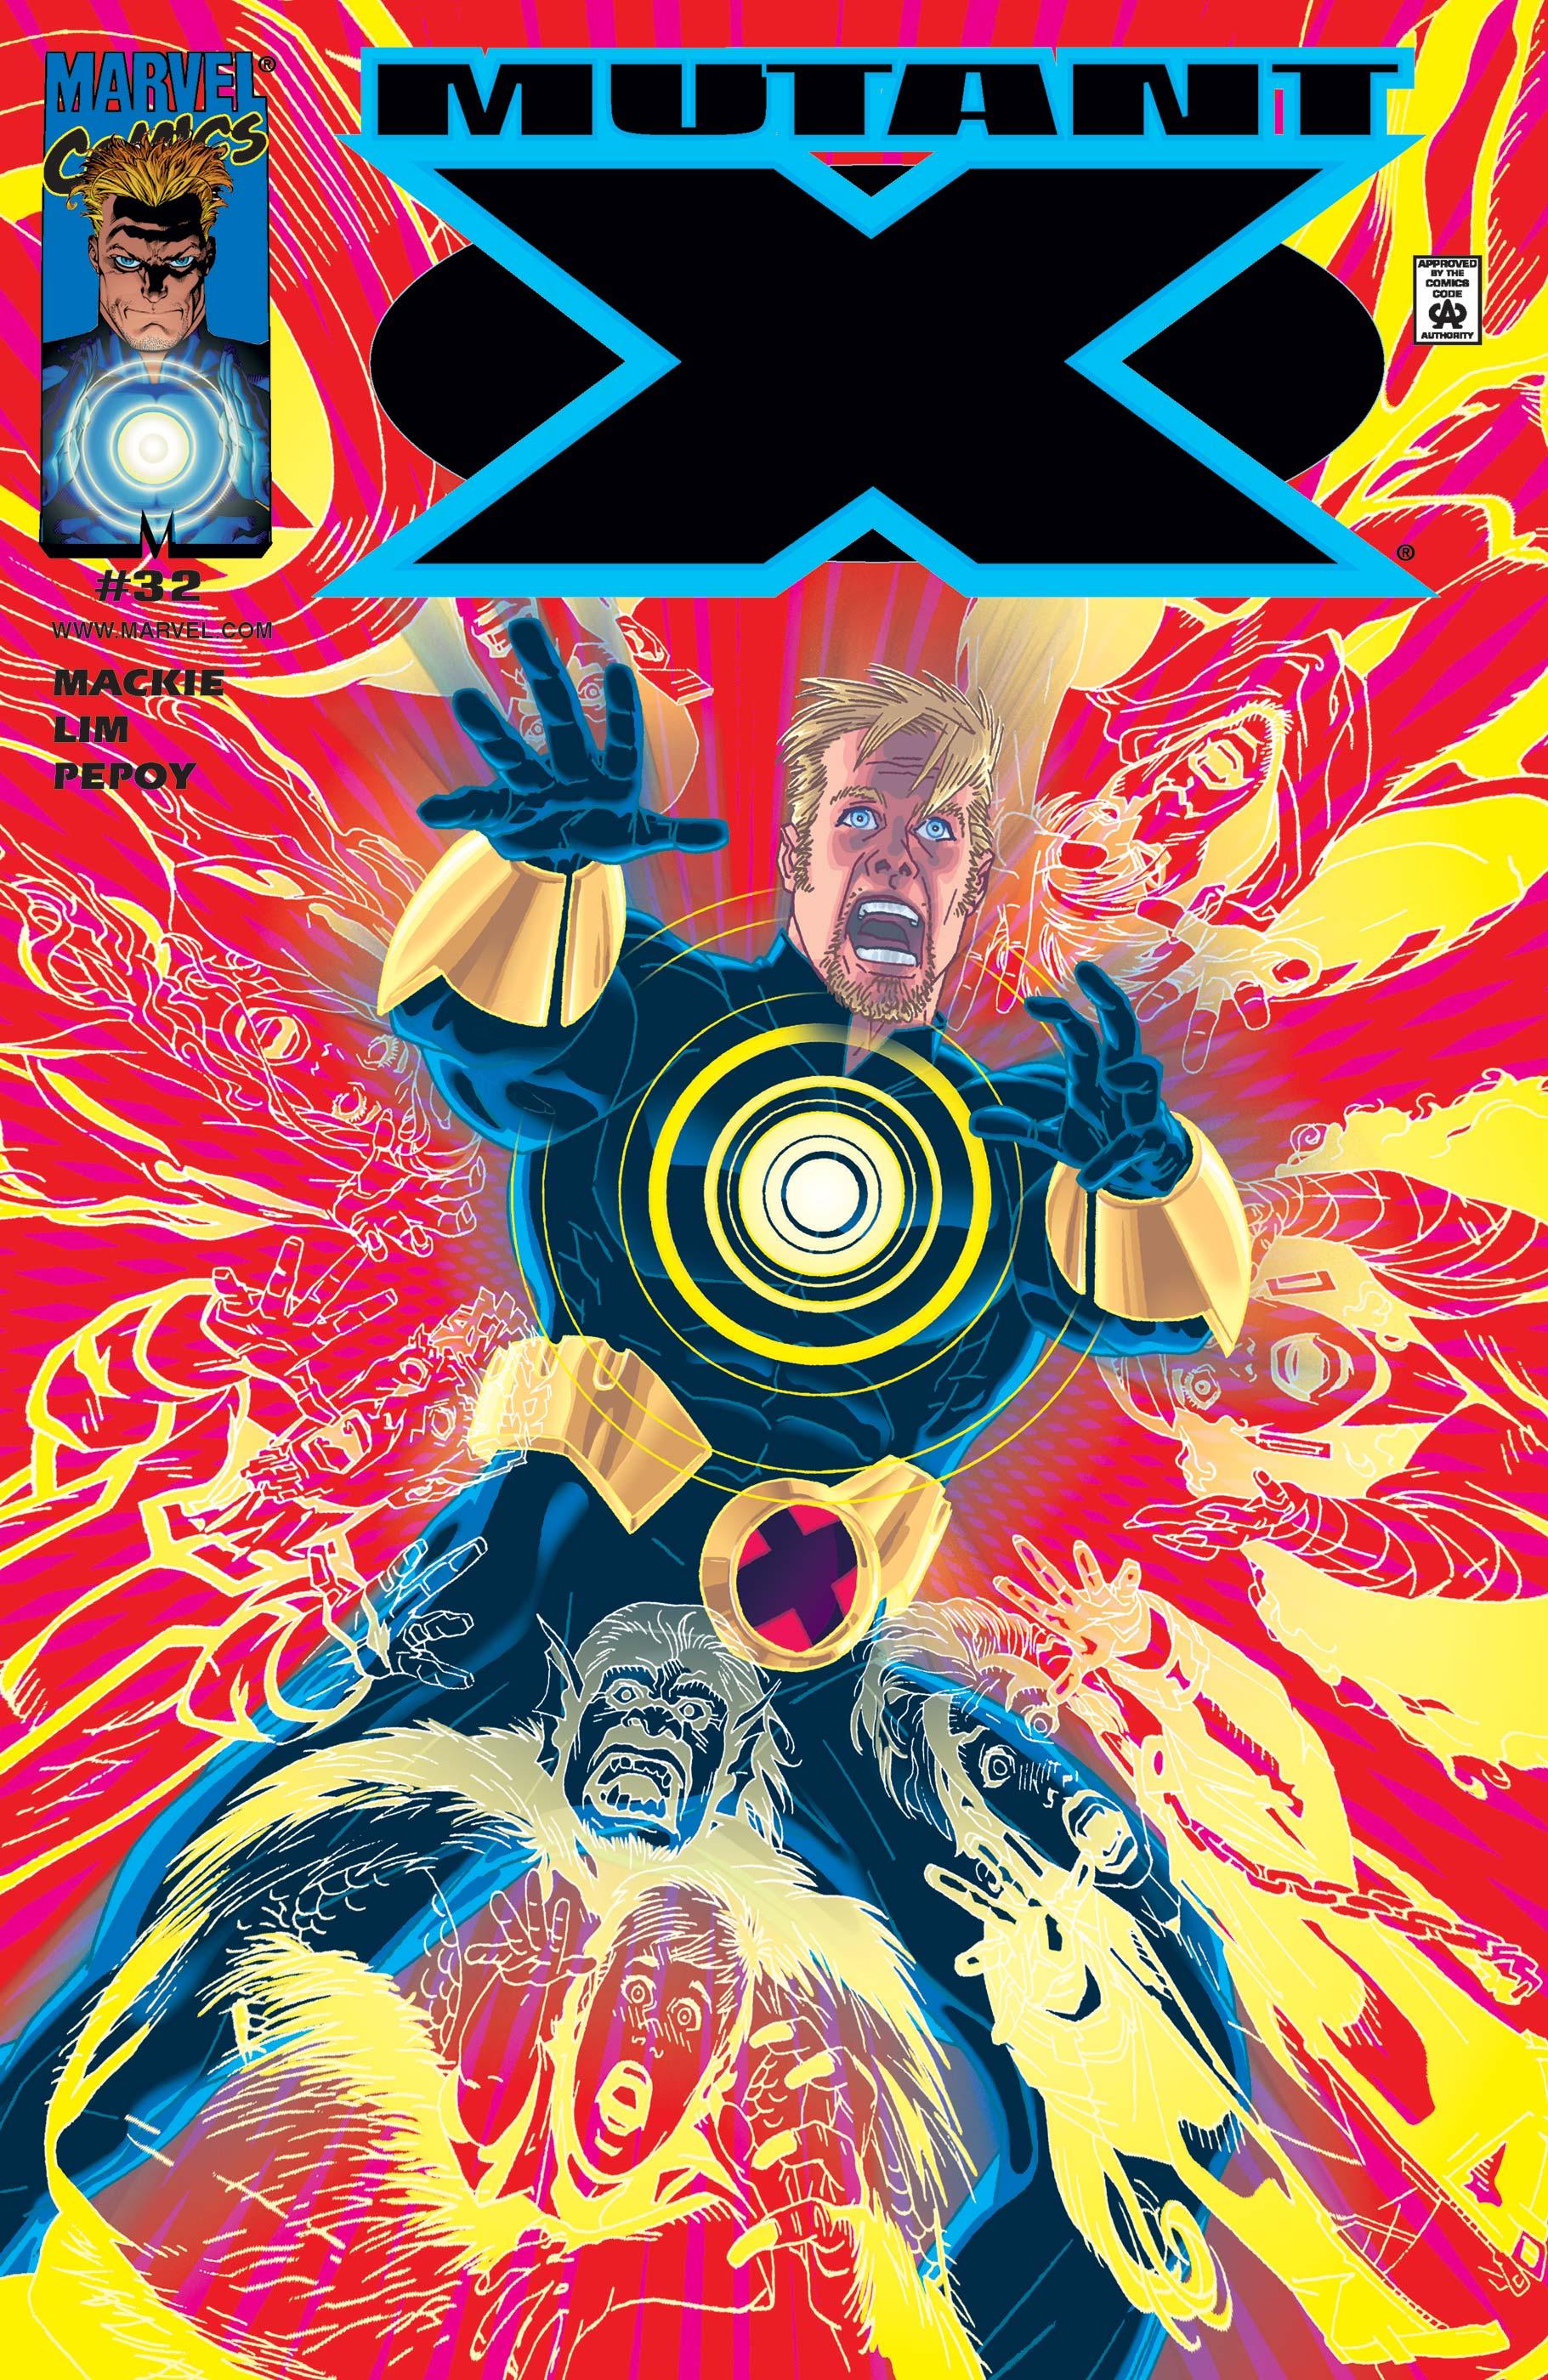 Mutant X (1998) #32